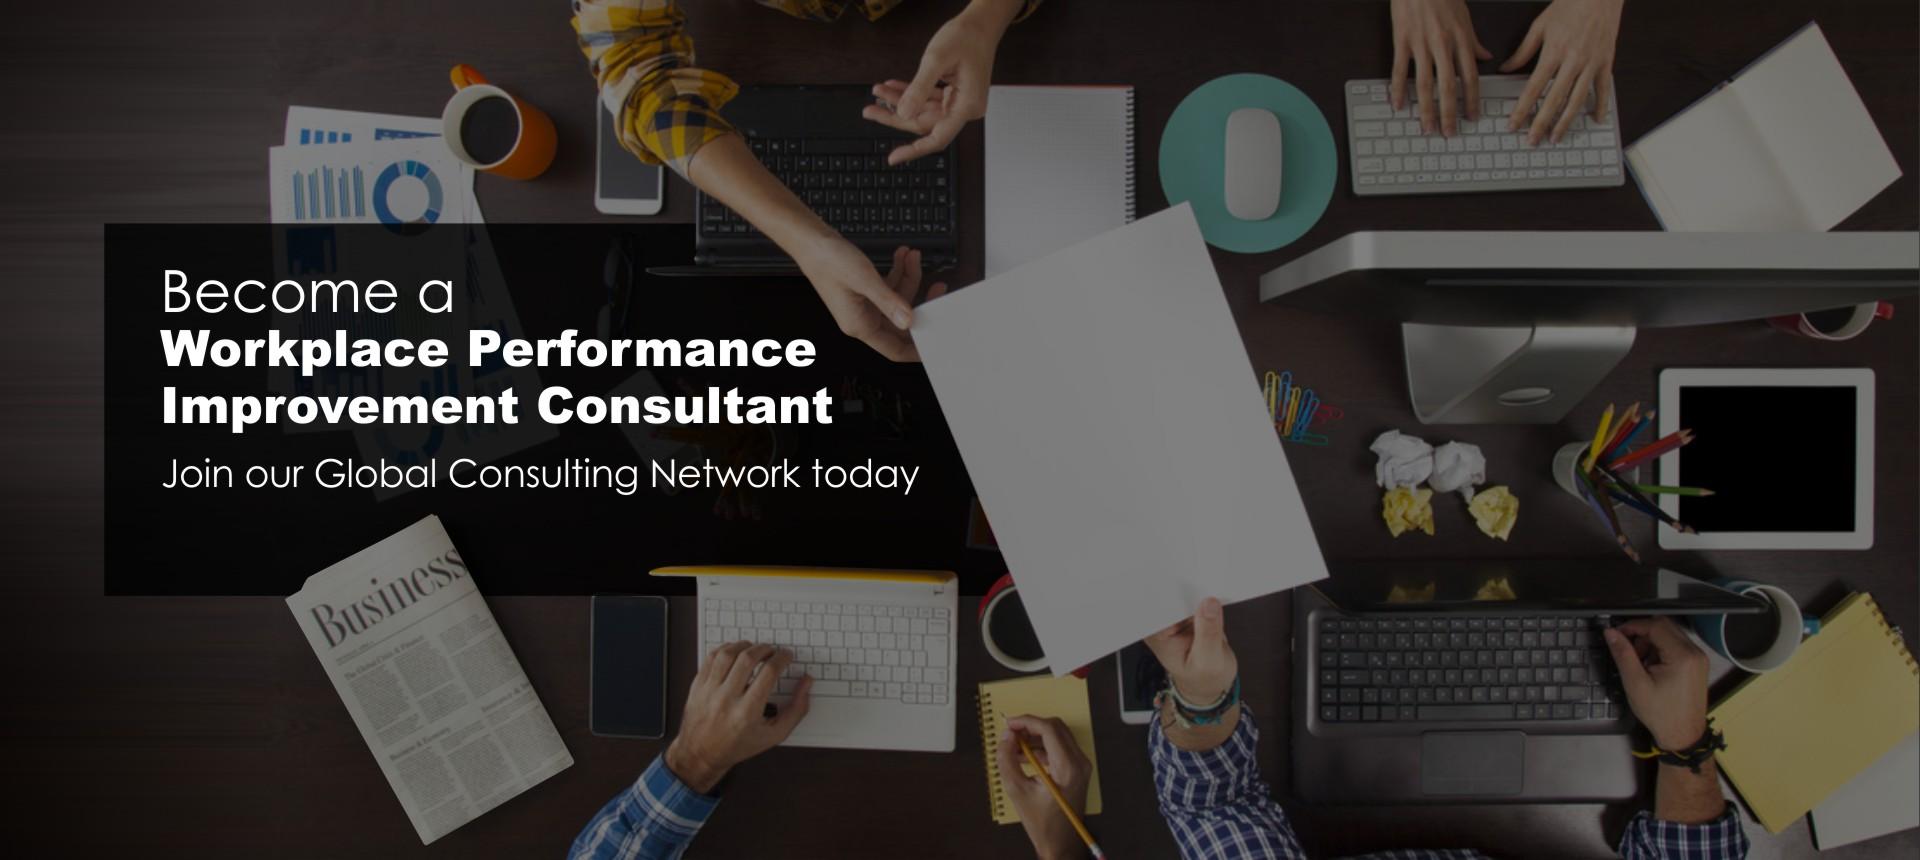 skillfarm-Sliders_for_DiSC_workplace_performance